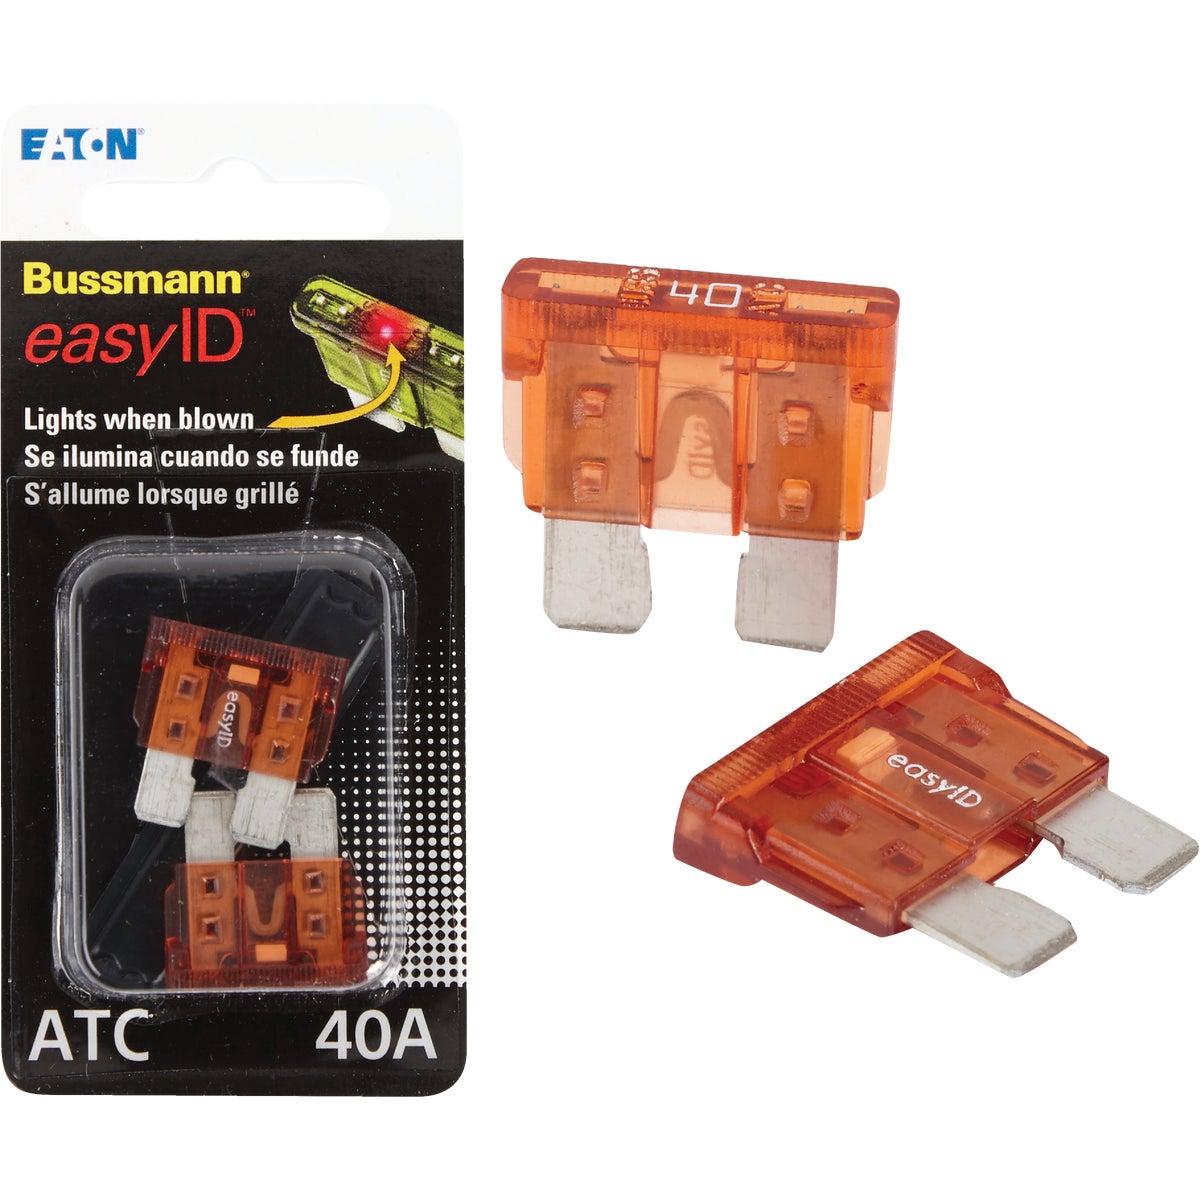 2PK 40A ATC EASY ID FUSE